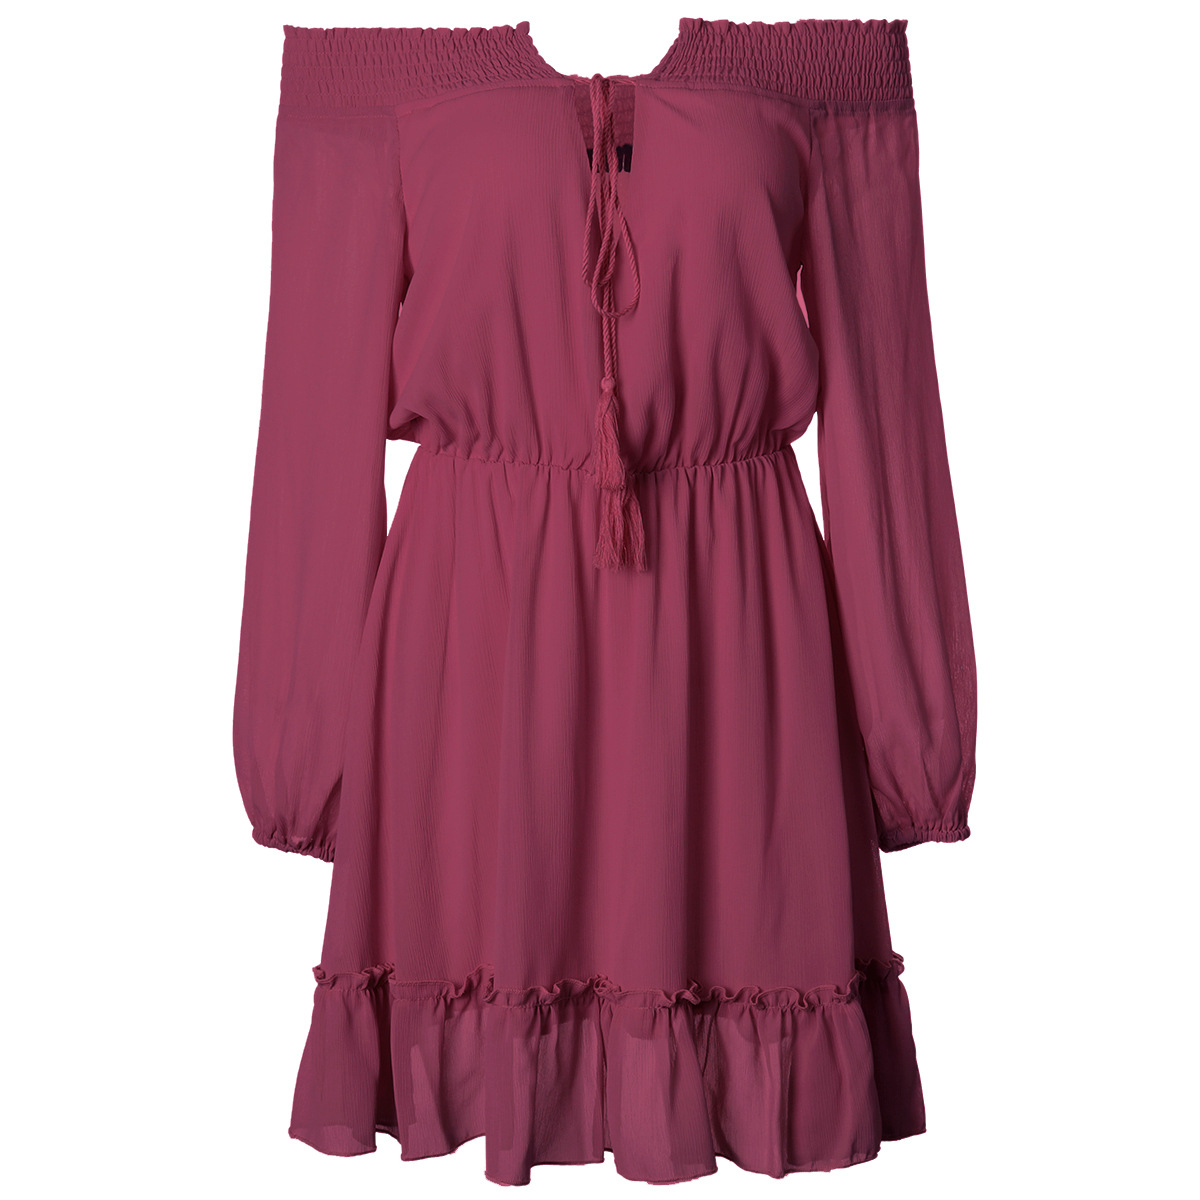 chiffon dress sexy summer dresses pink 2019 fashion plus size womens elegant clothing woman party night bohemian